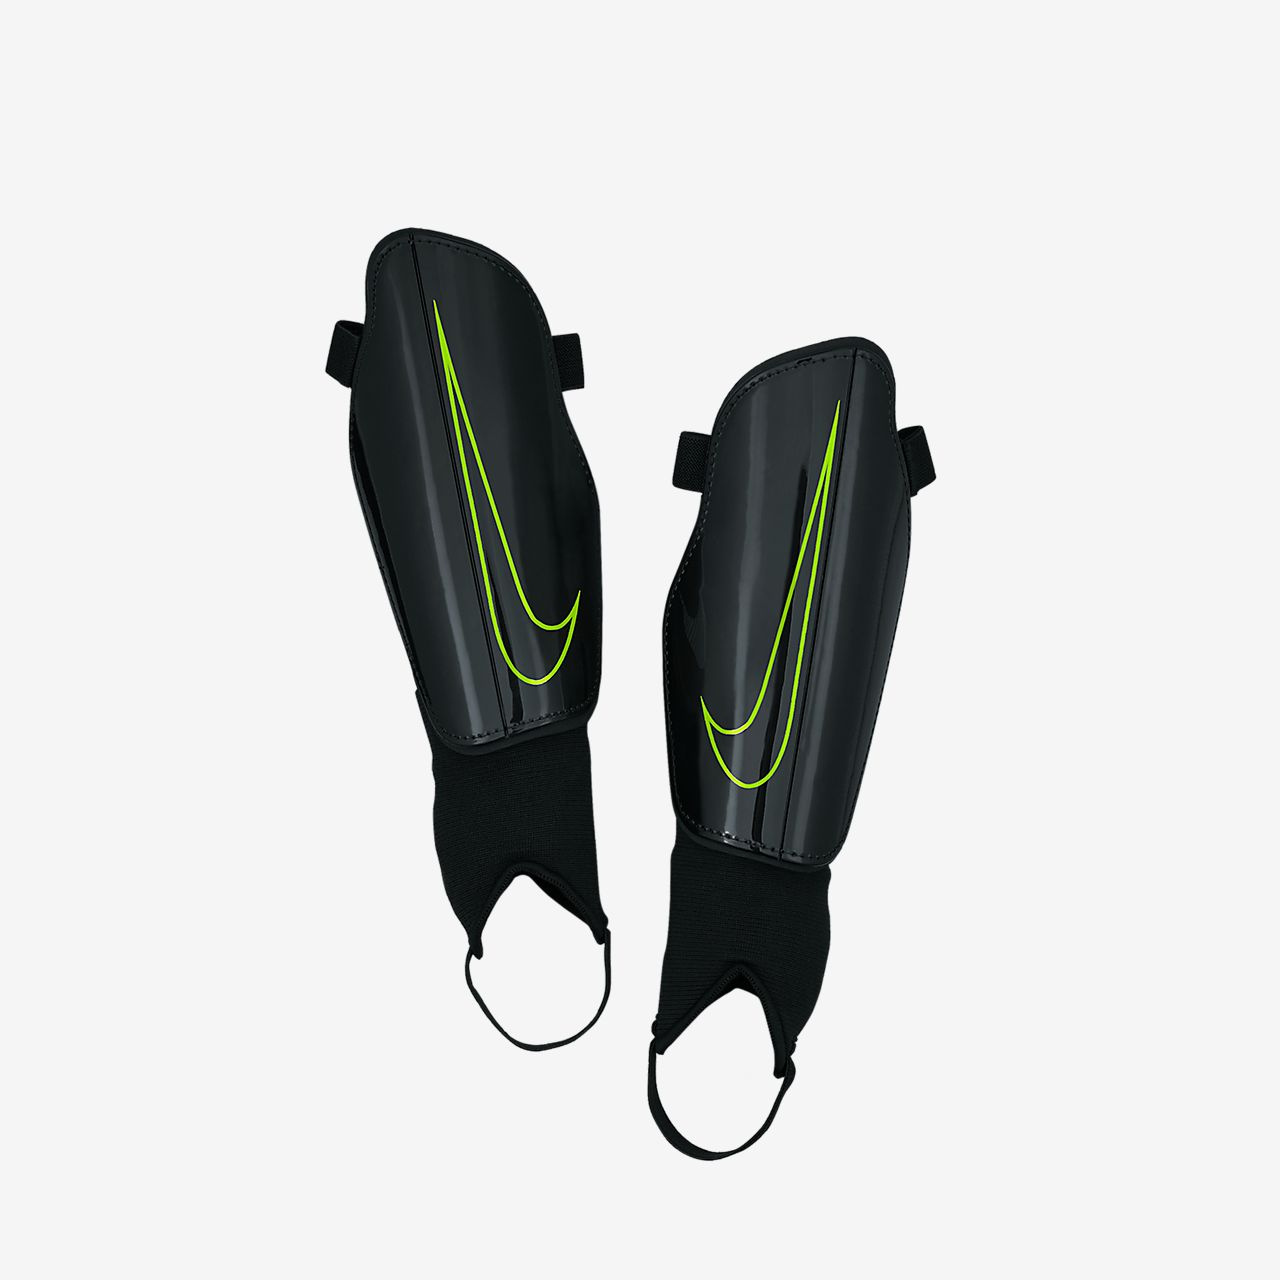 Parastinchi da calcio Nike Charge 2.0